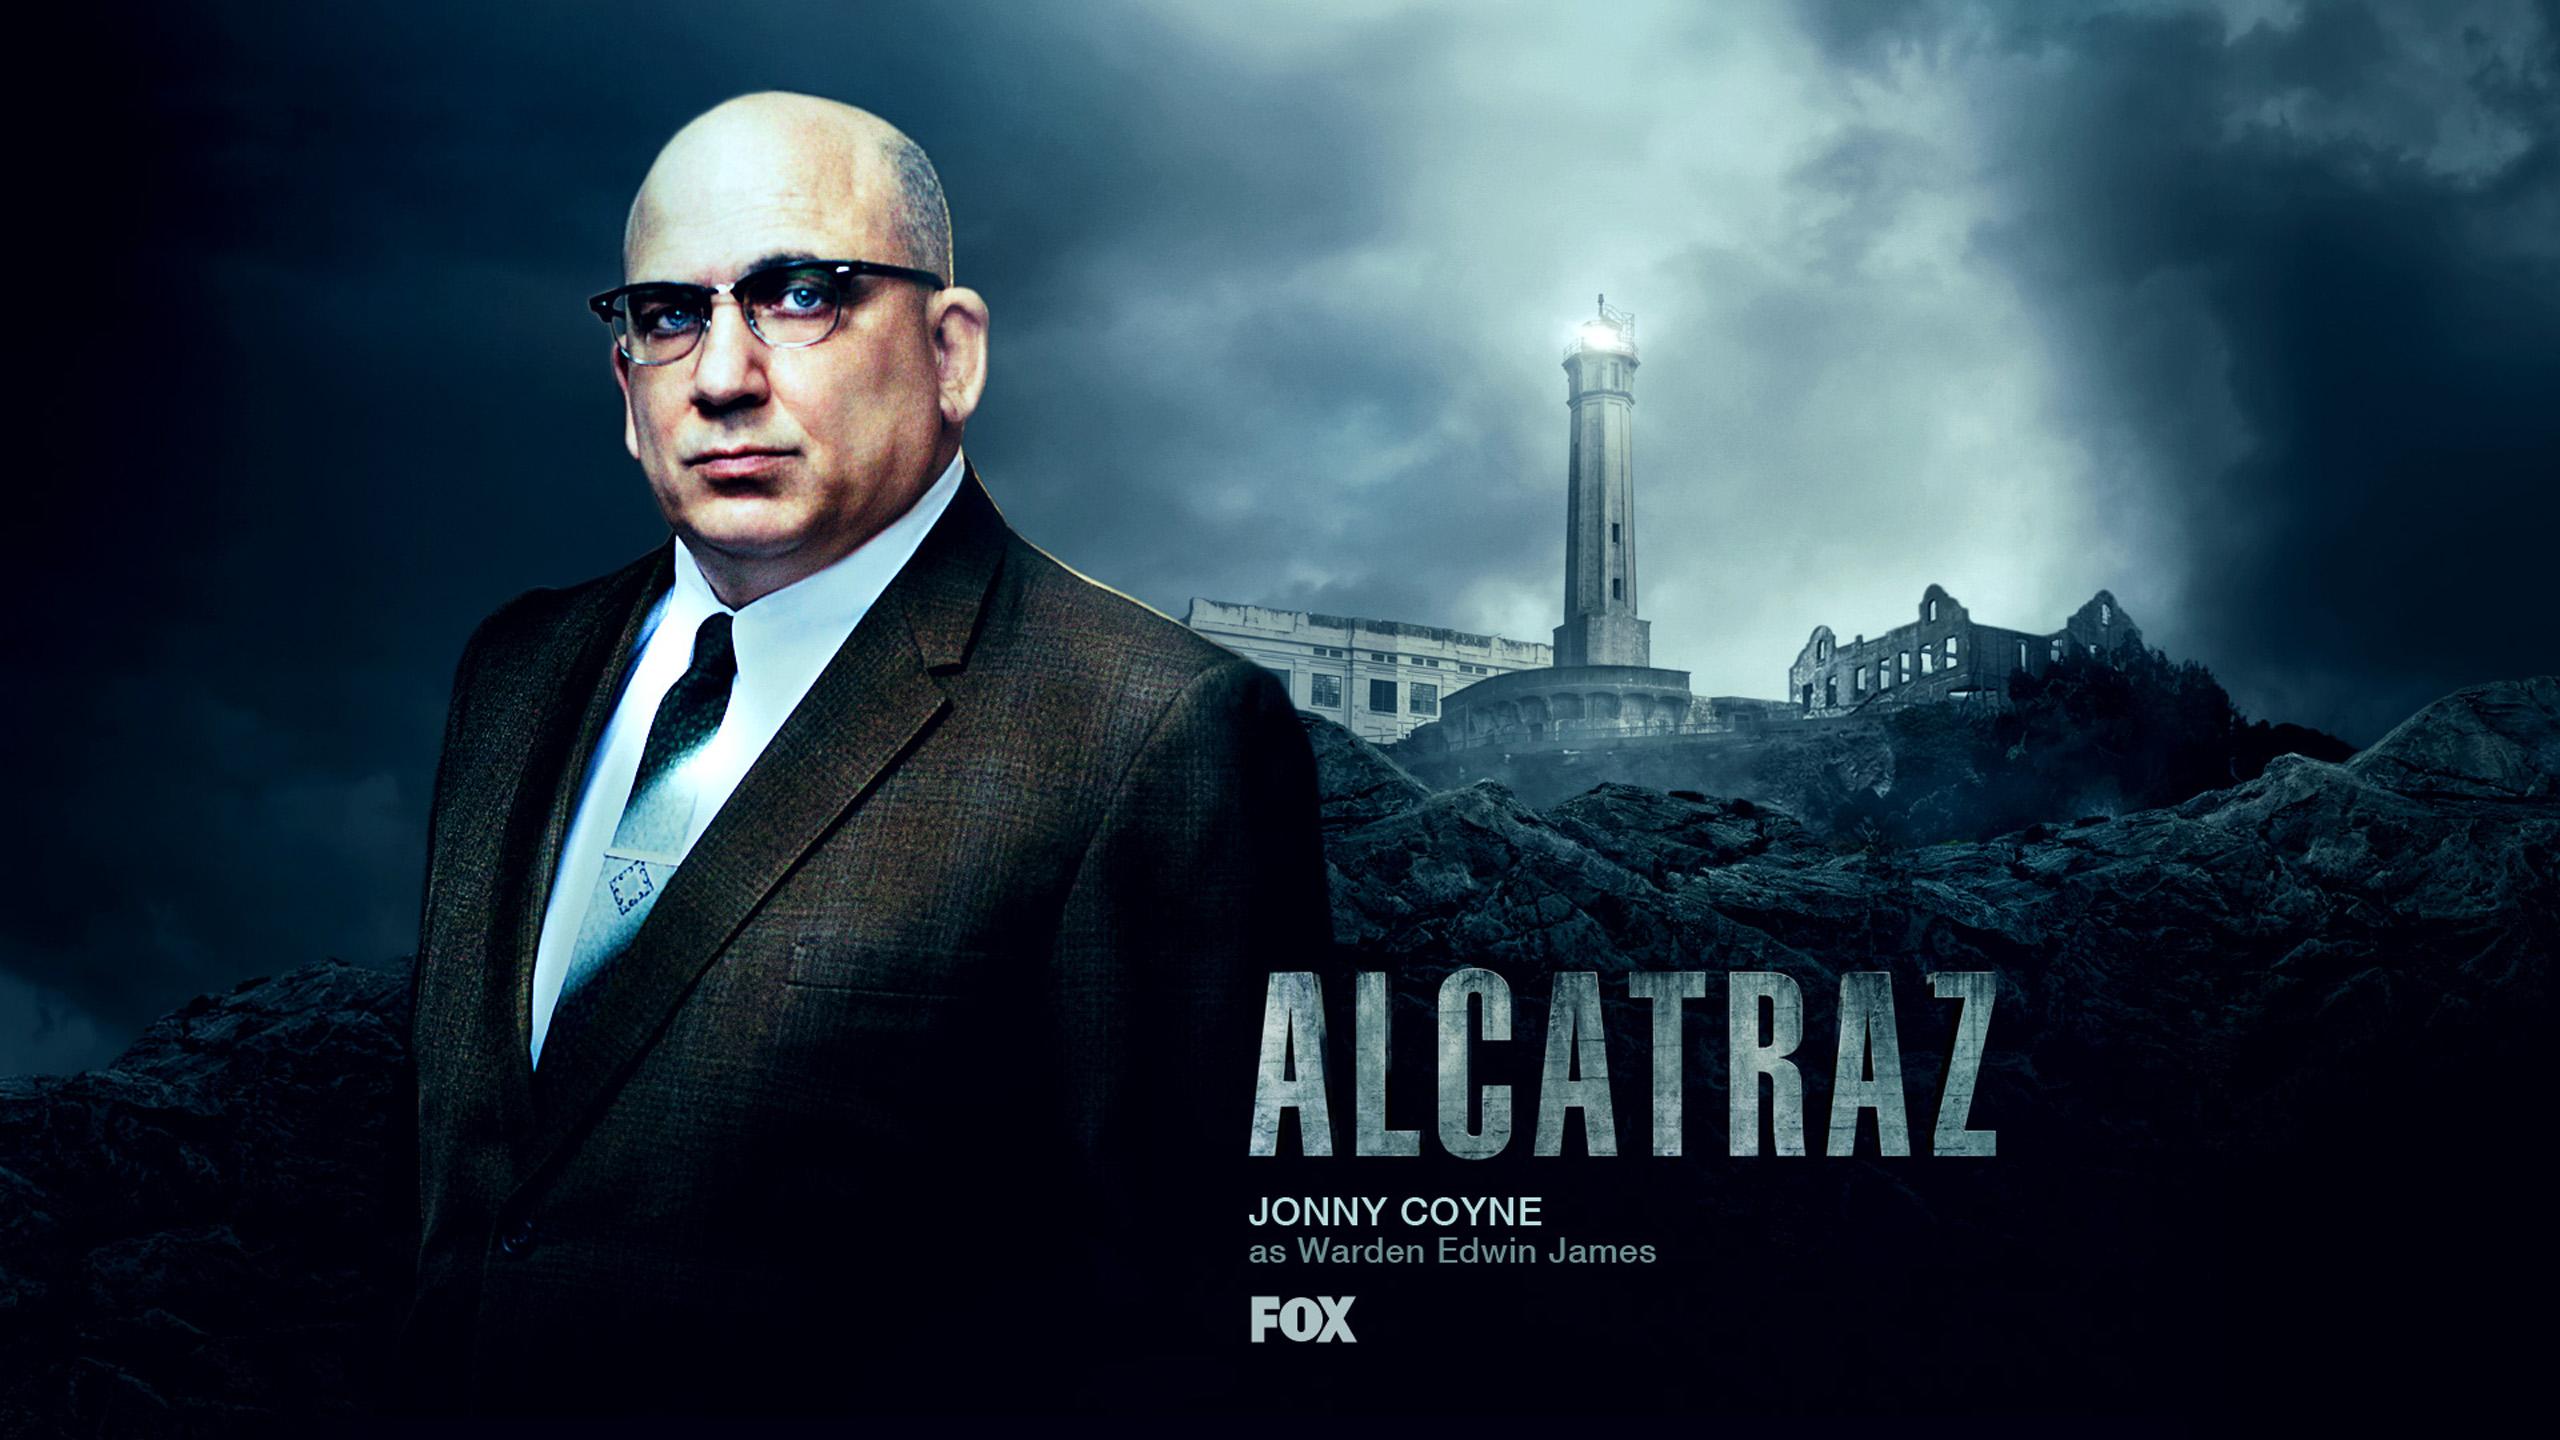 22025_alcatraz_wallpaper_09_122_206lo.jpg